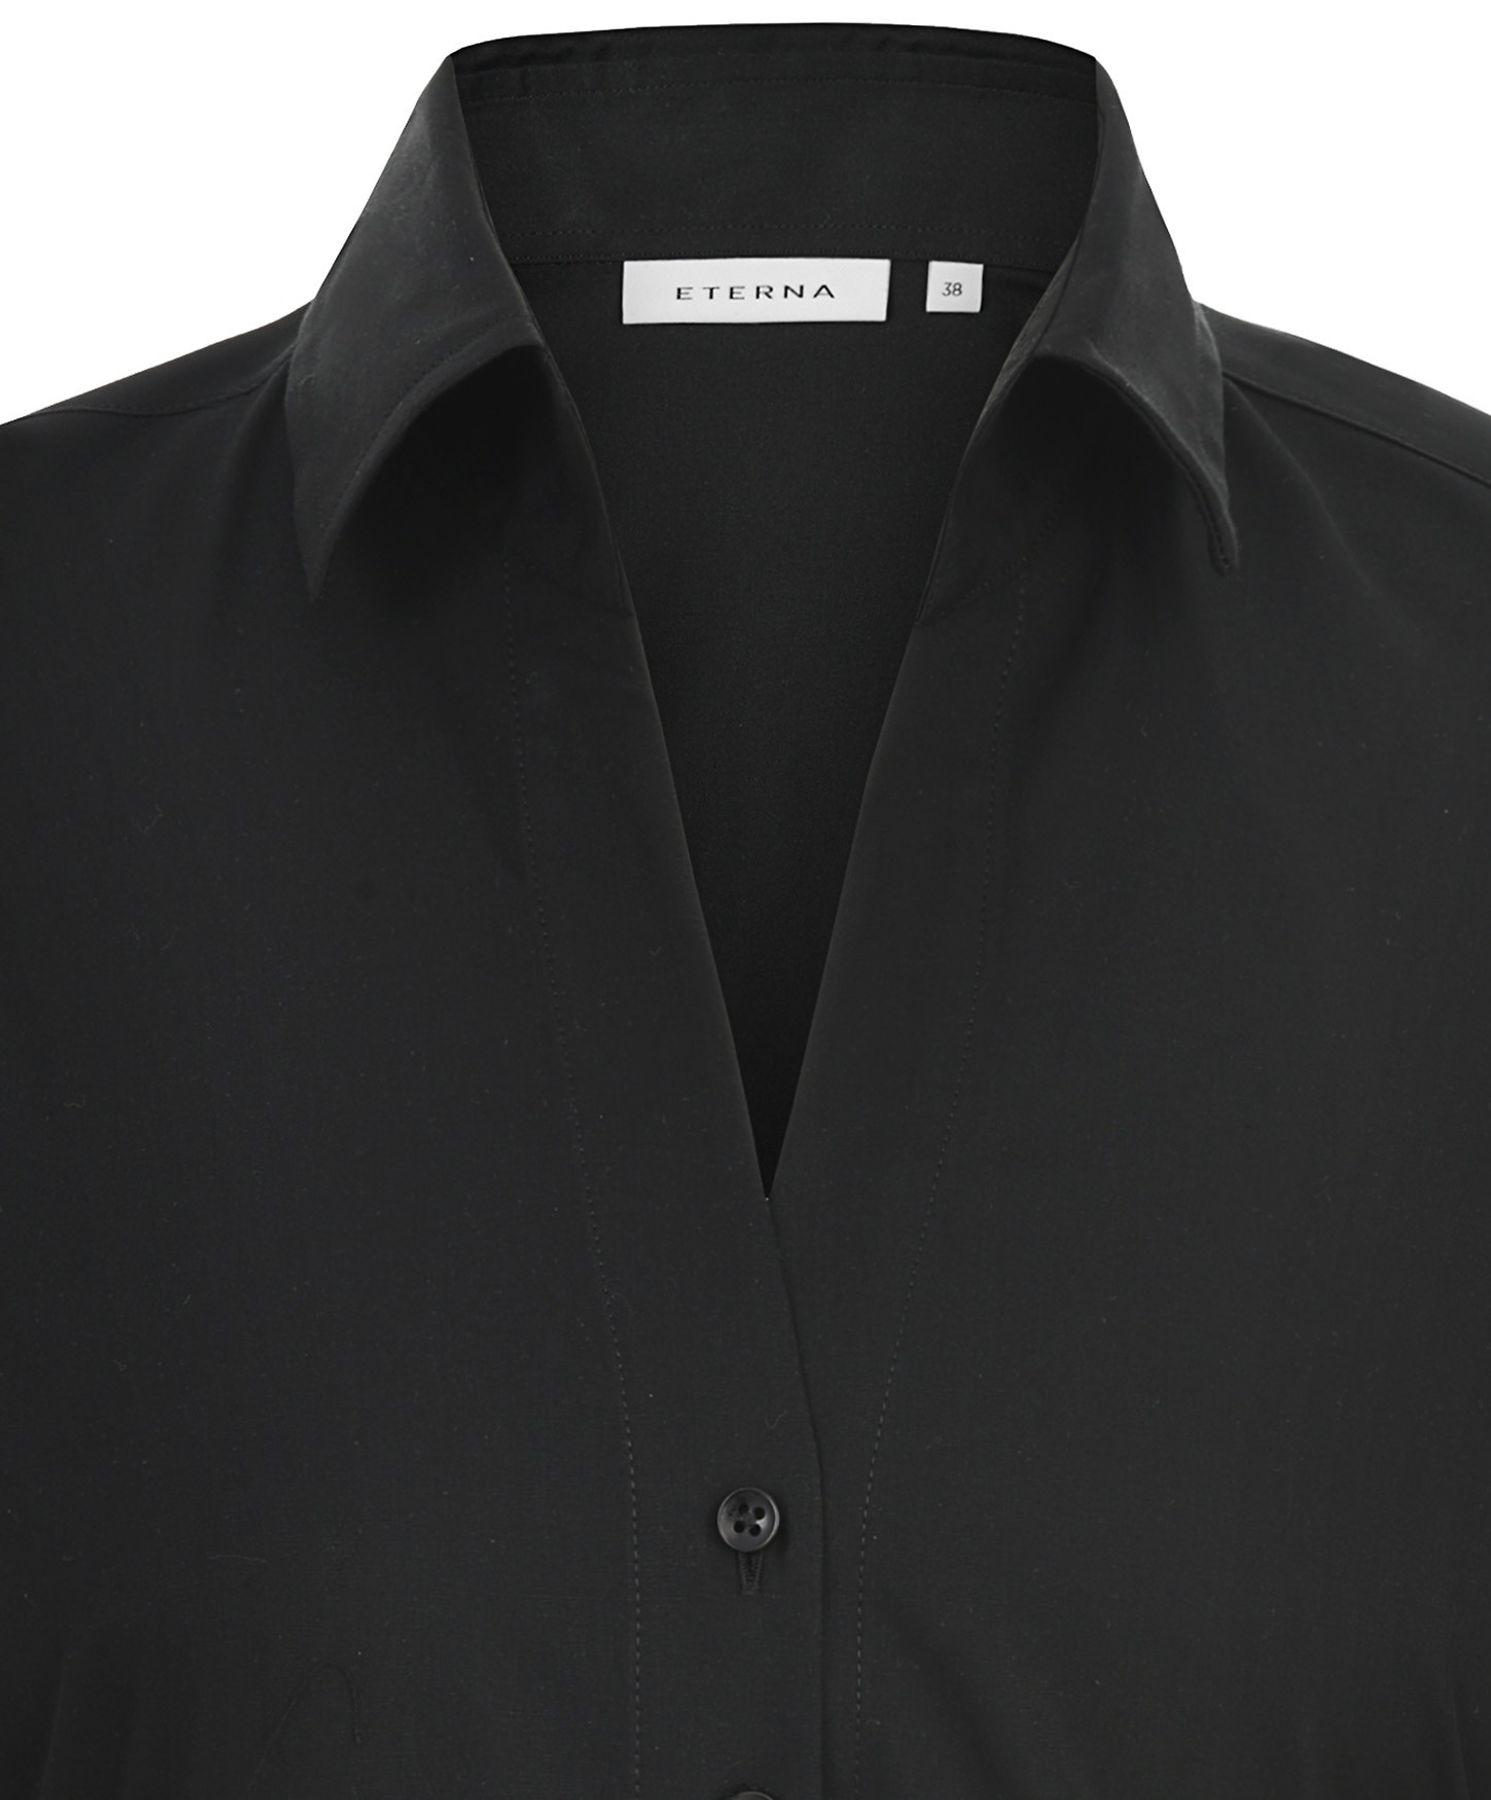 Eterna -  Comfort-Fit - Damen Langarm Bluse in Hellblau kariert  (5330 D661) – Bild 10